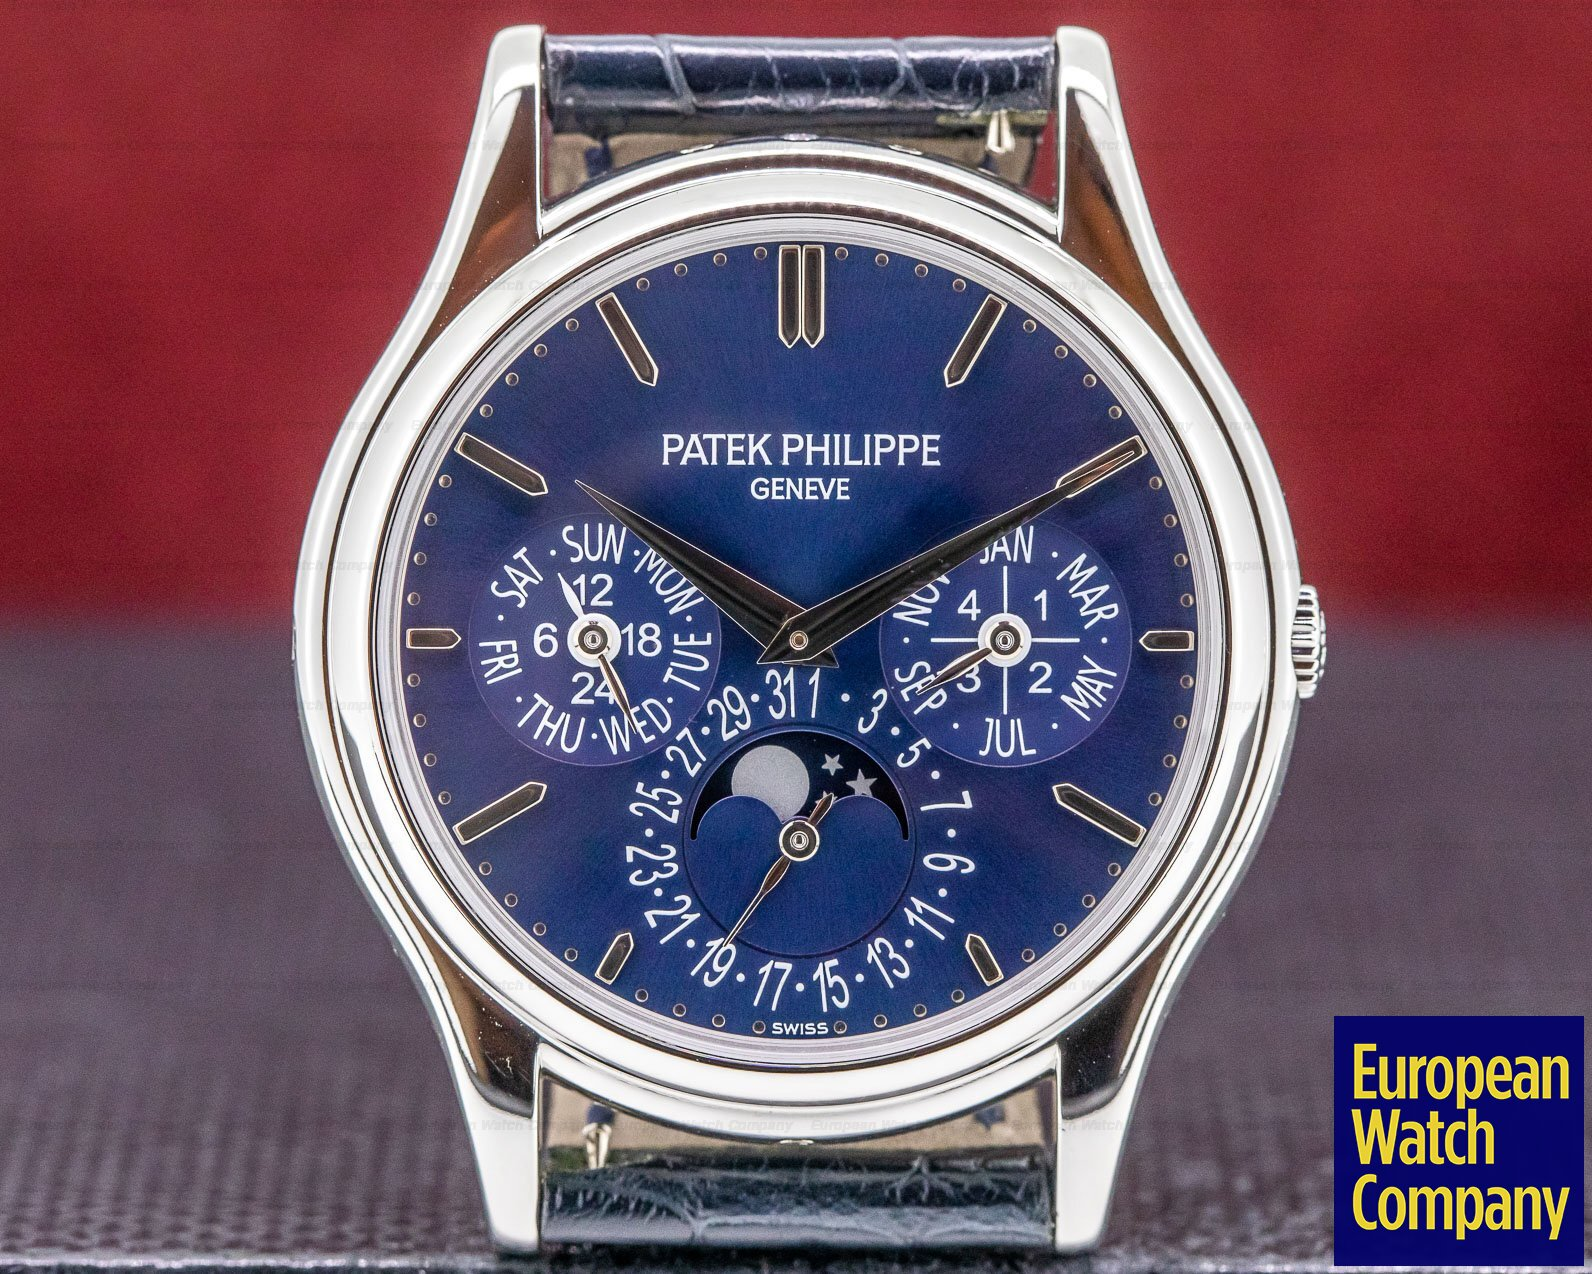 Patek Philippe 5140P-001 Perpetual Calendar 5140P Platinum Blue Dial